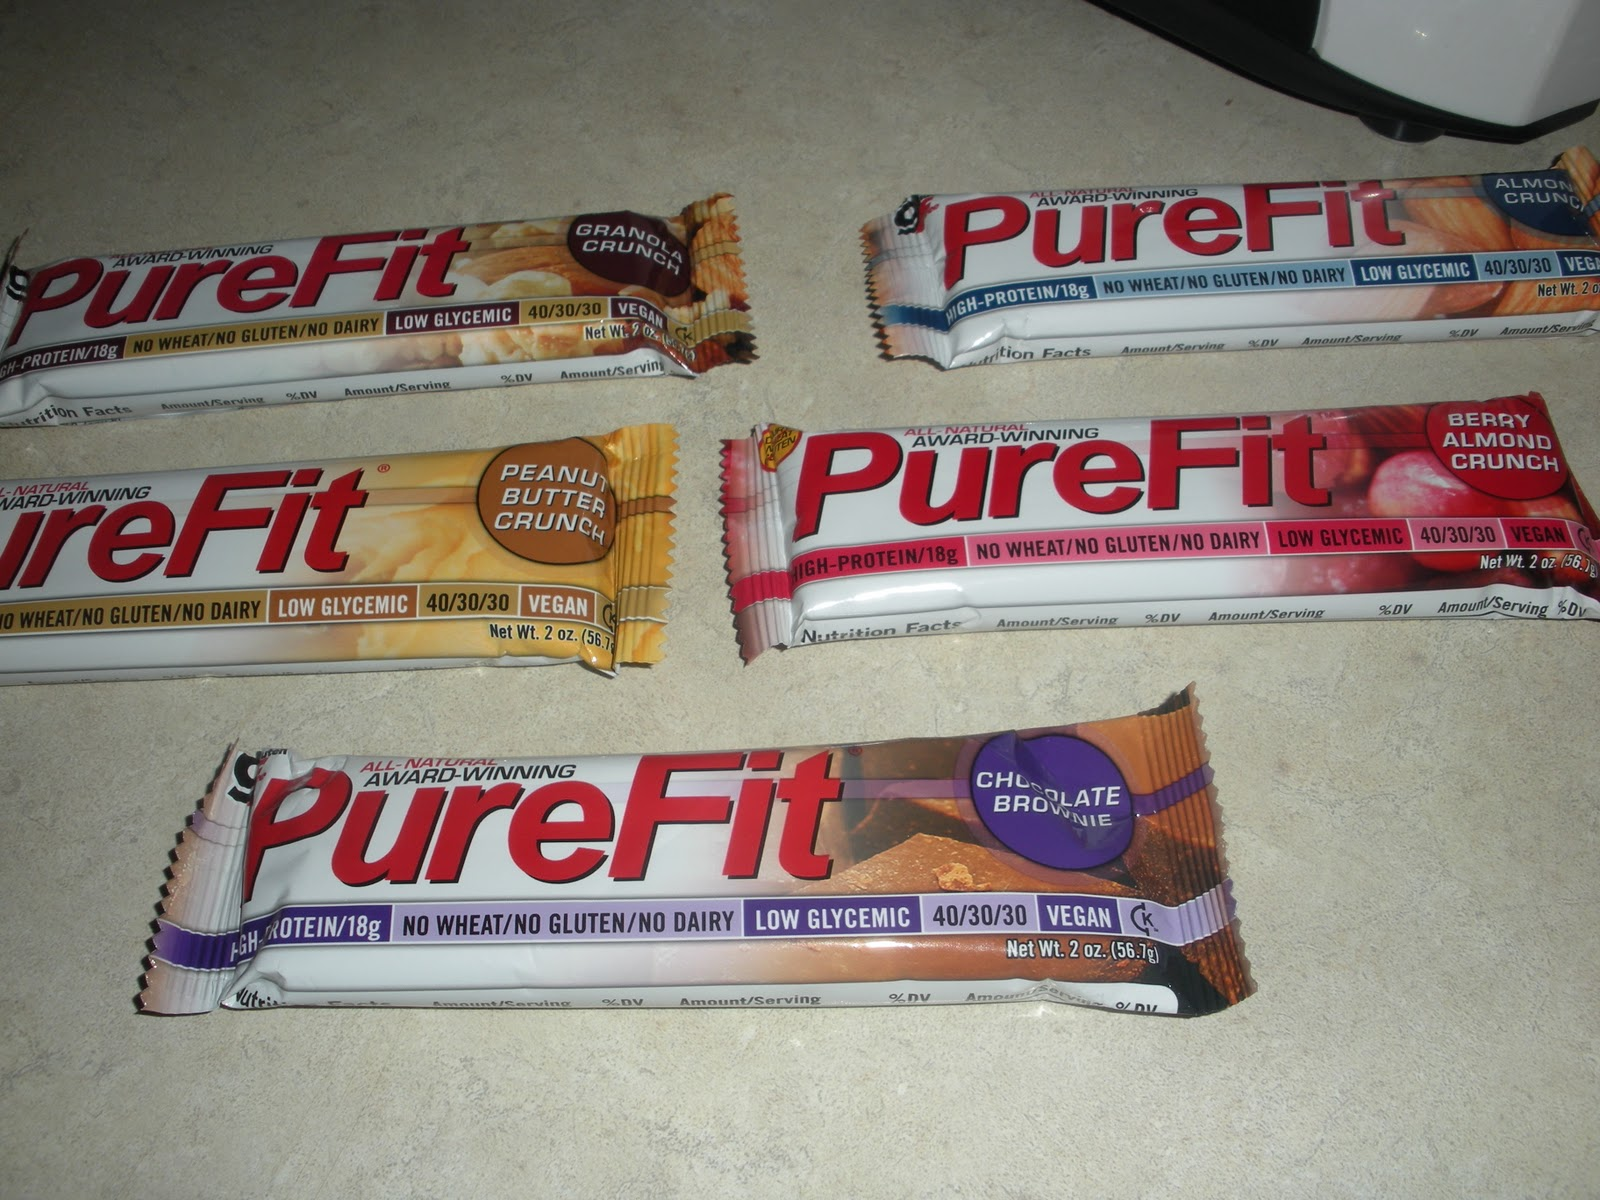 Purefit bar